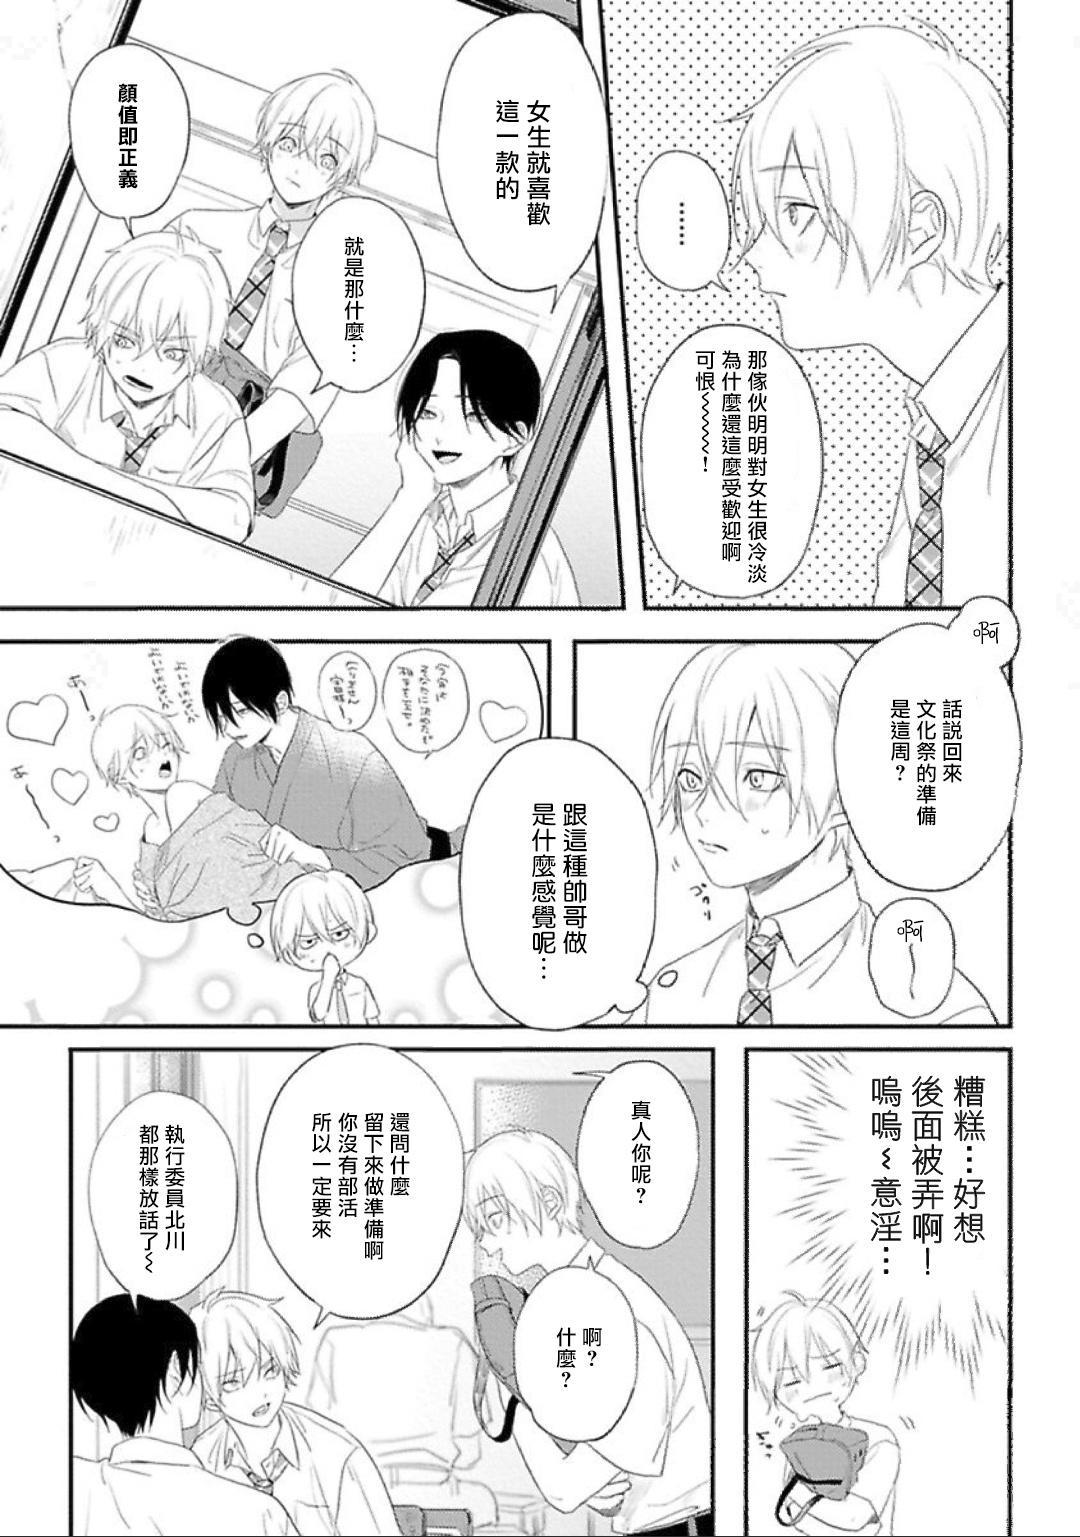 [Utata Hakuto] Houkago Virginity - Virginity afterschool 1-5 完结 [Chinese] [拾荒者汉化组] [Digital] 10